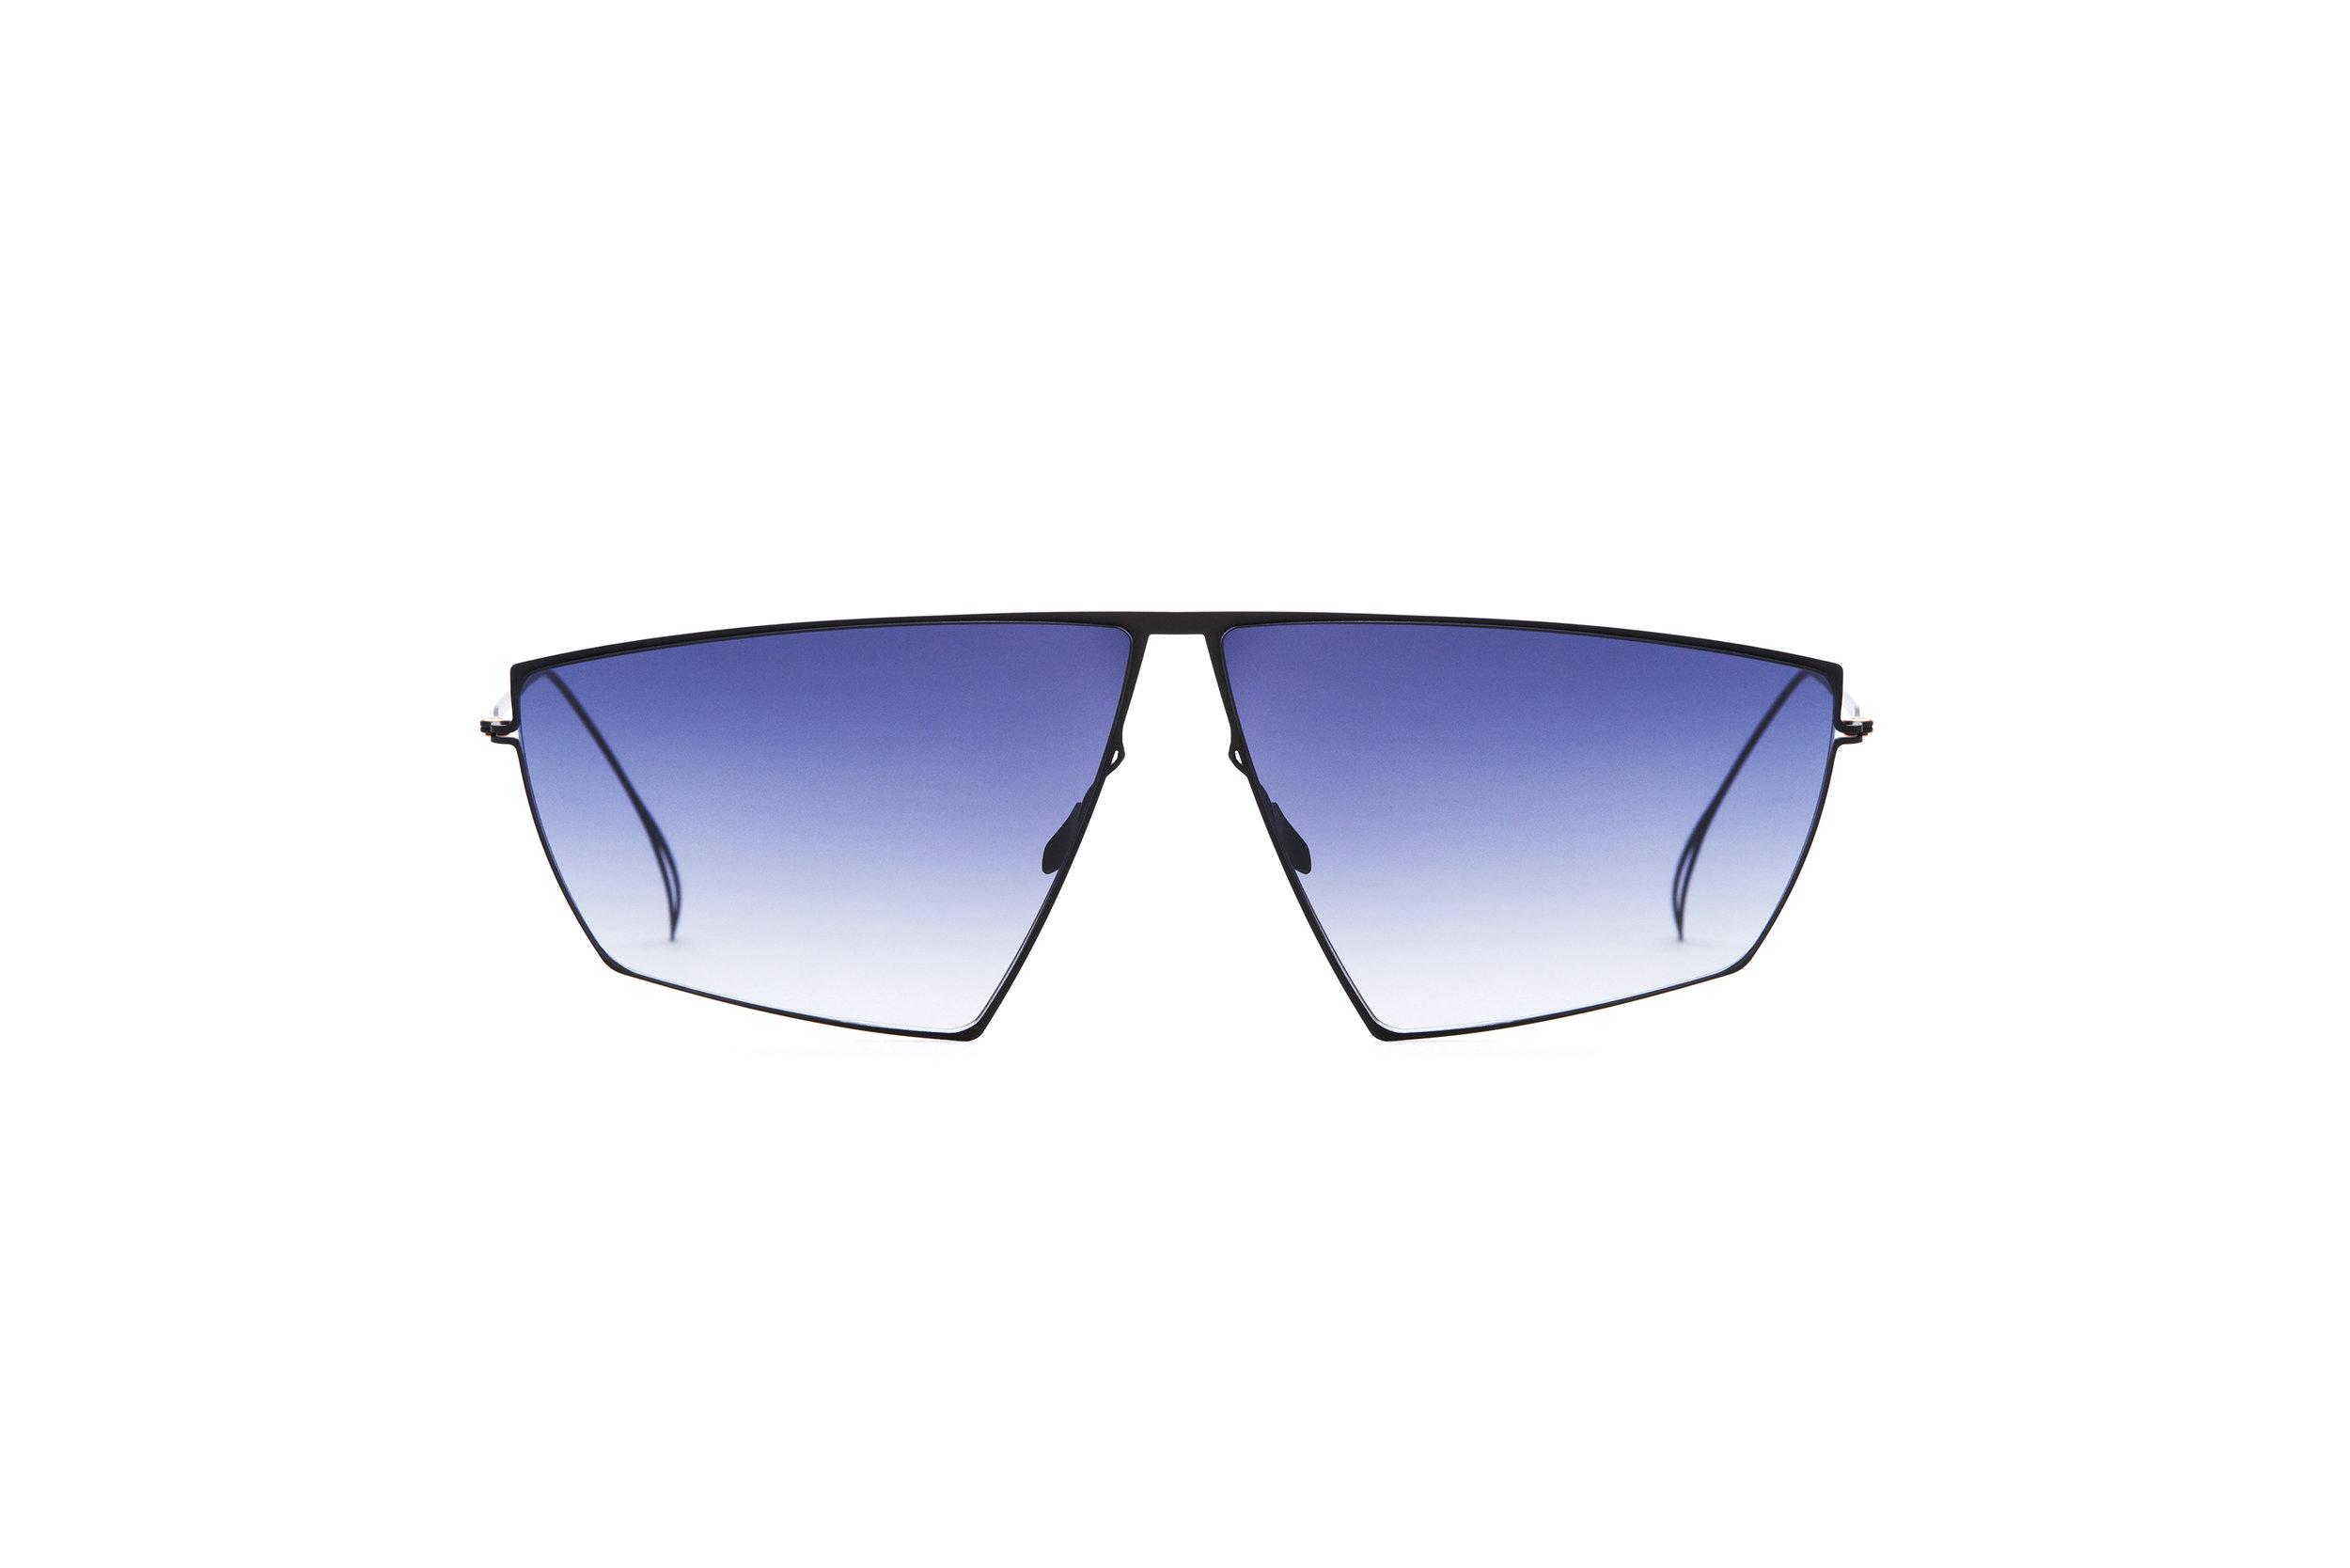 haffmans_neumeister_typhus_black_tempest_gradient_ultralight_sunglasses_front_102441.jpg